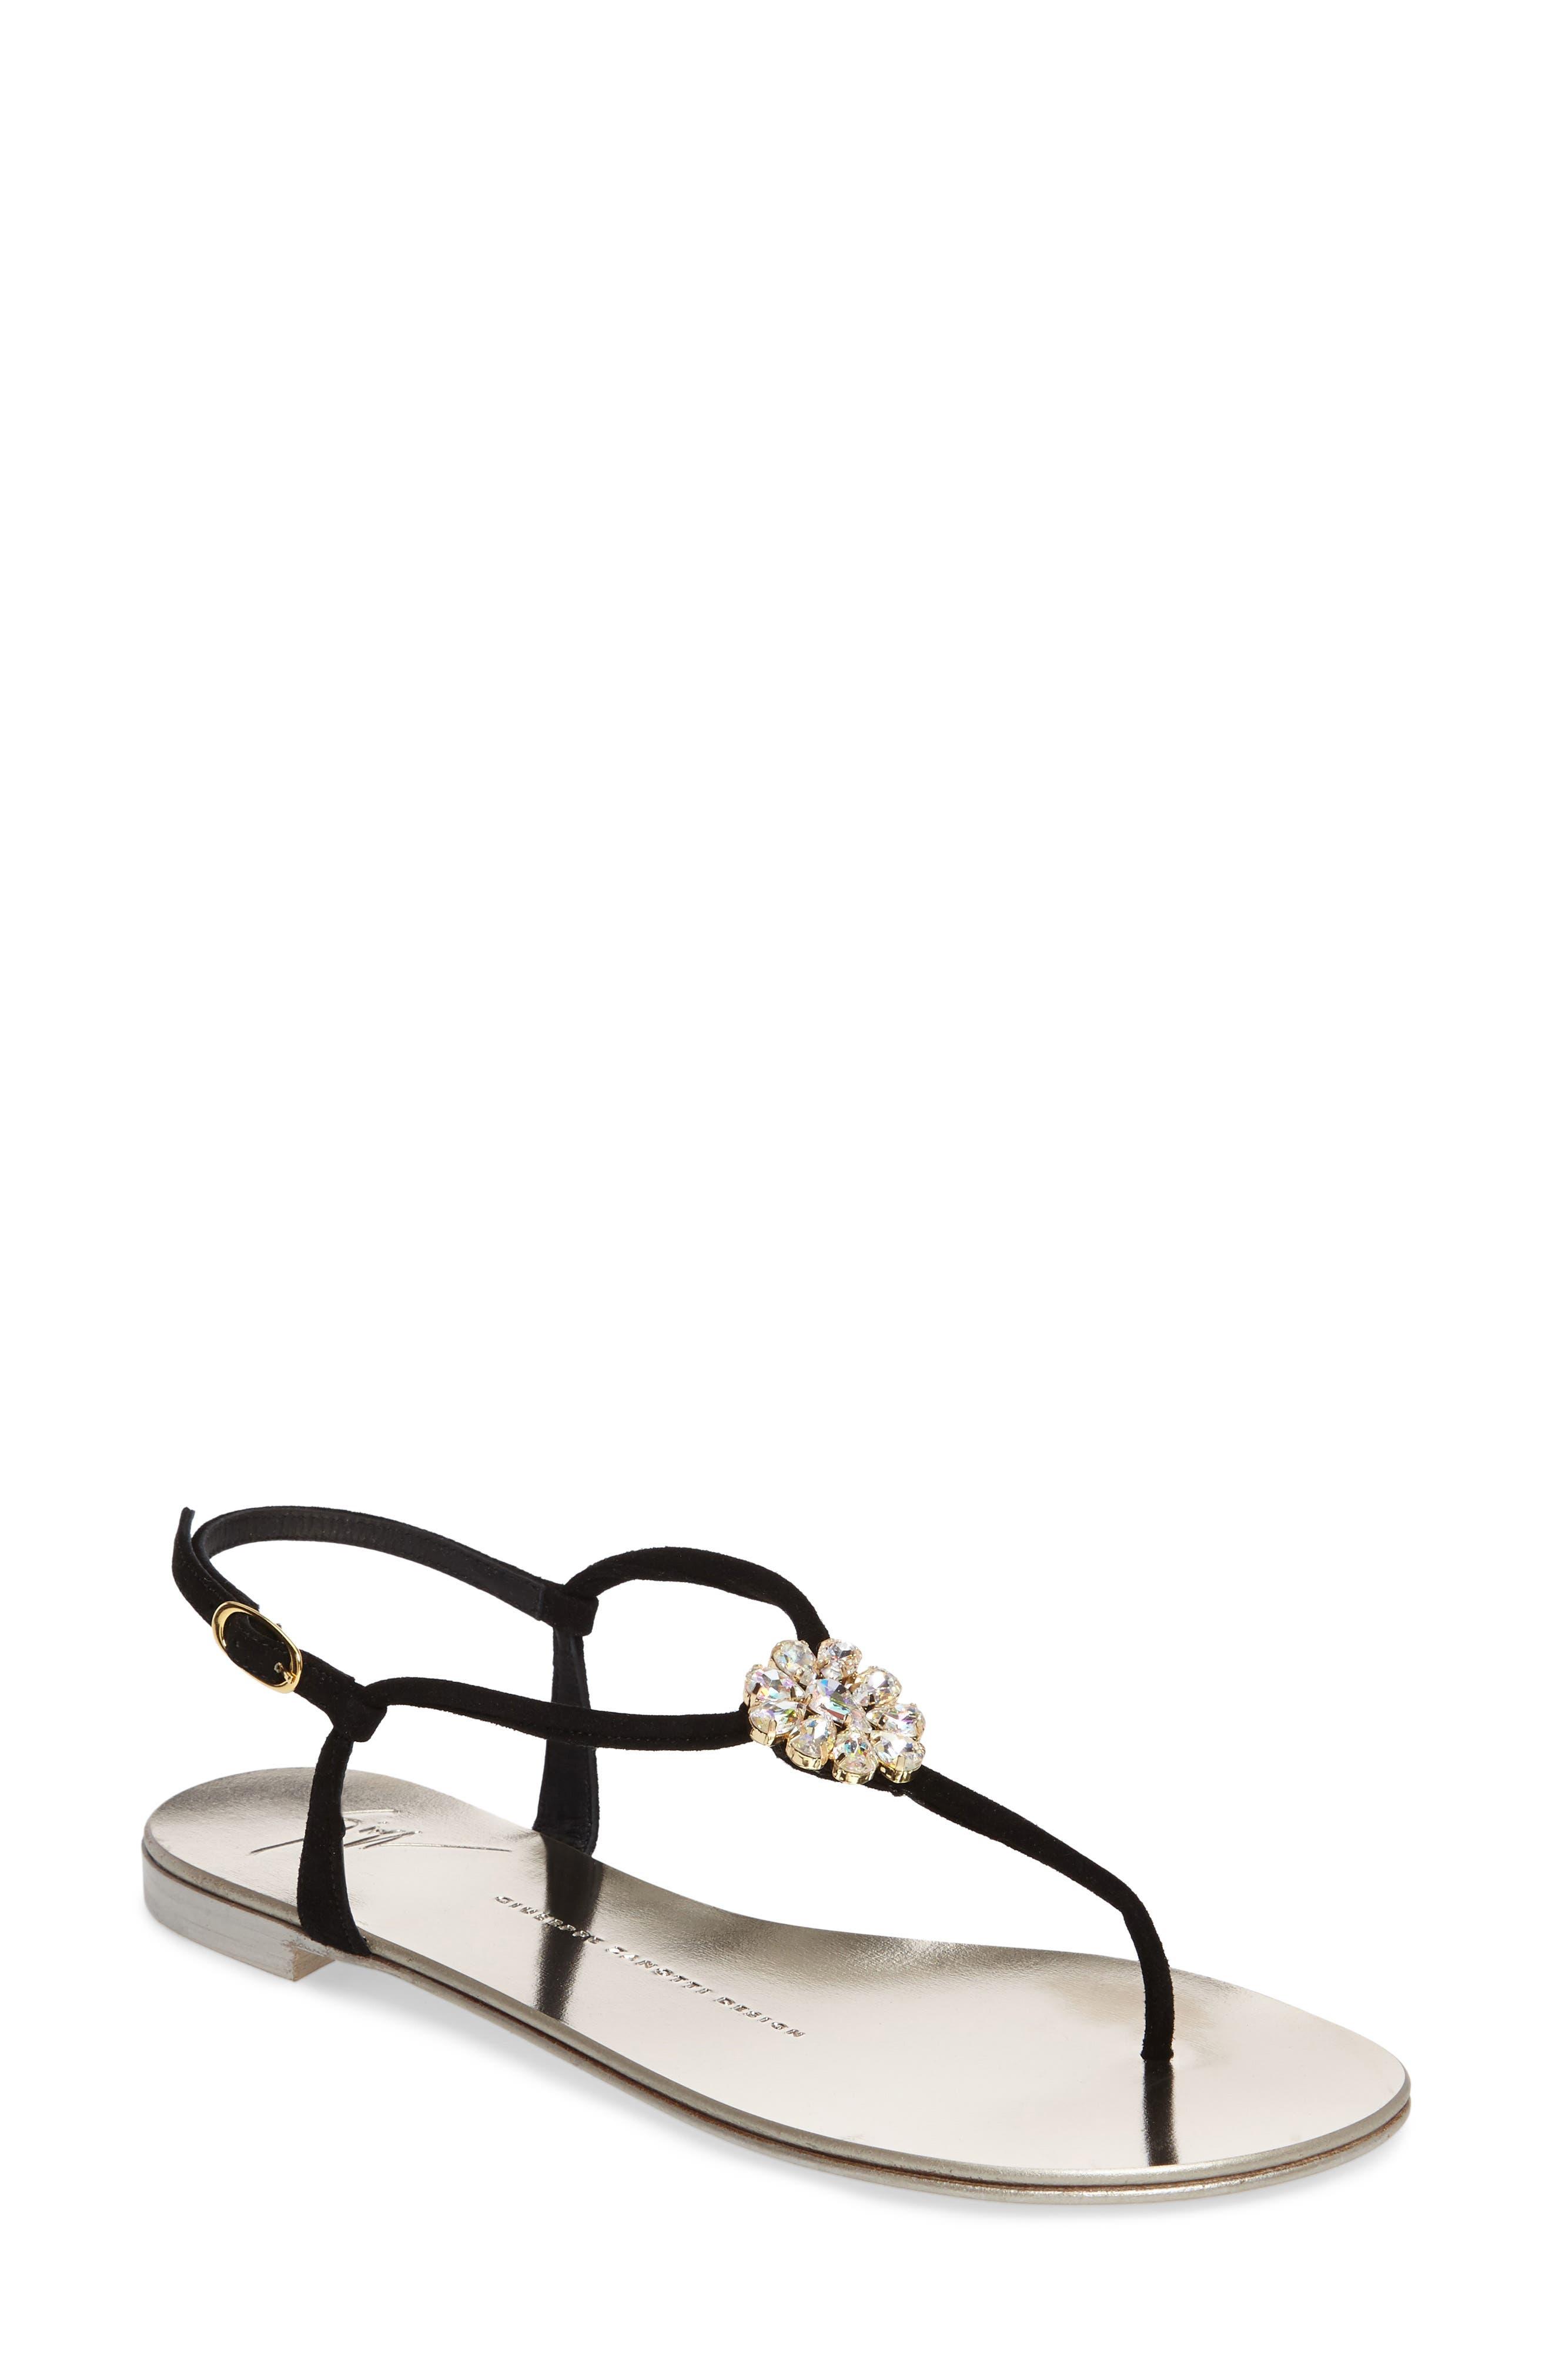 Crystal Sandal,                         Main,                         color, 001